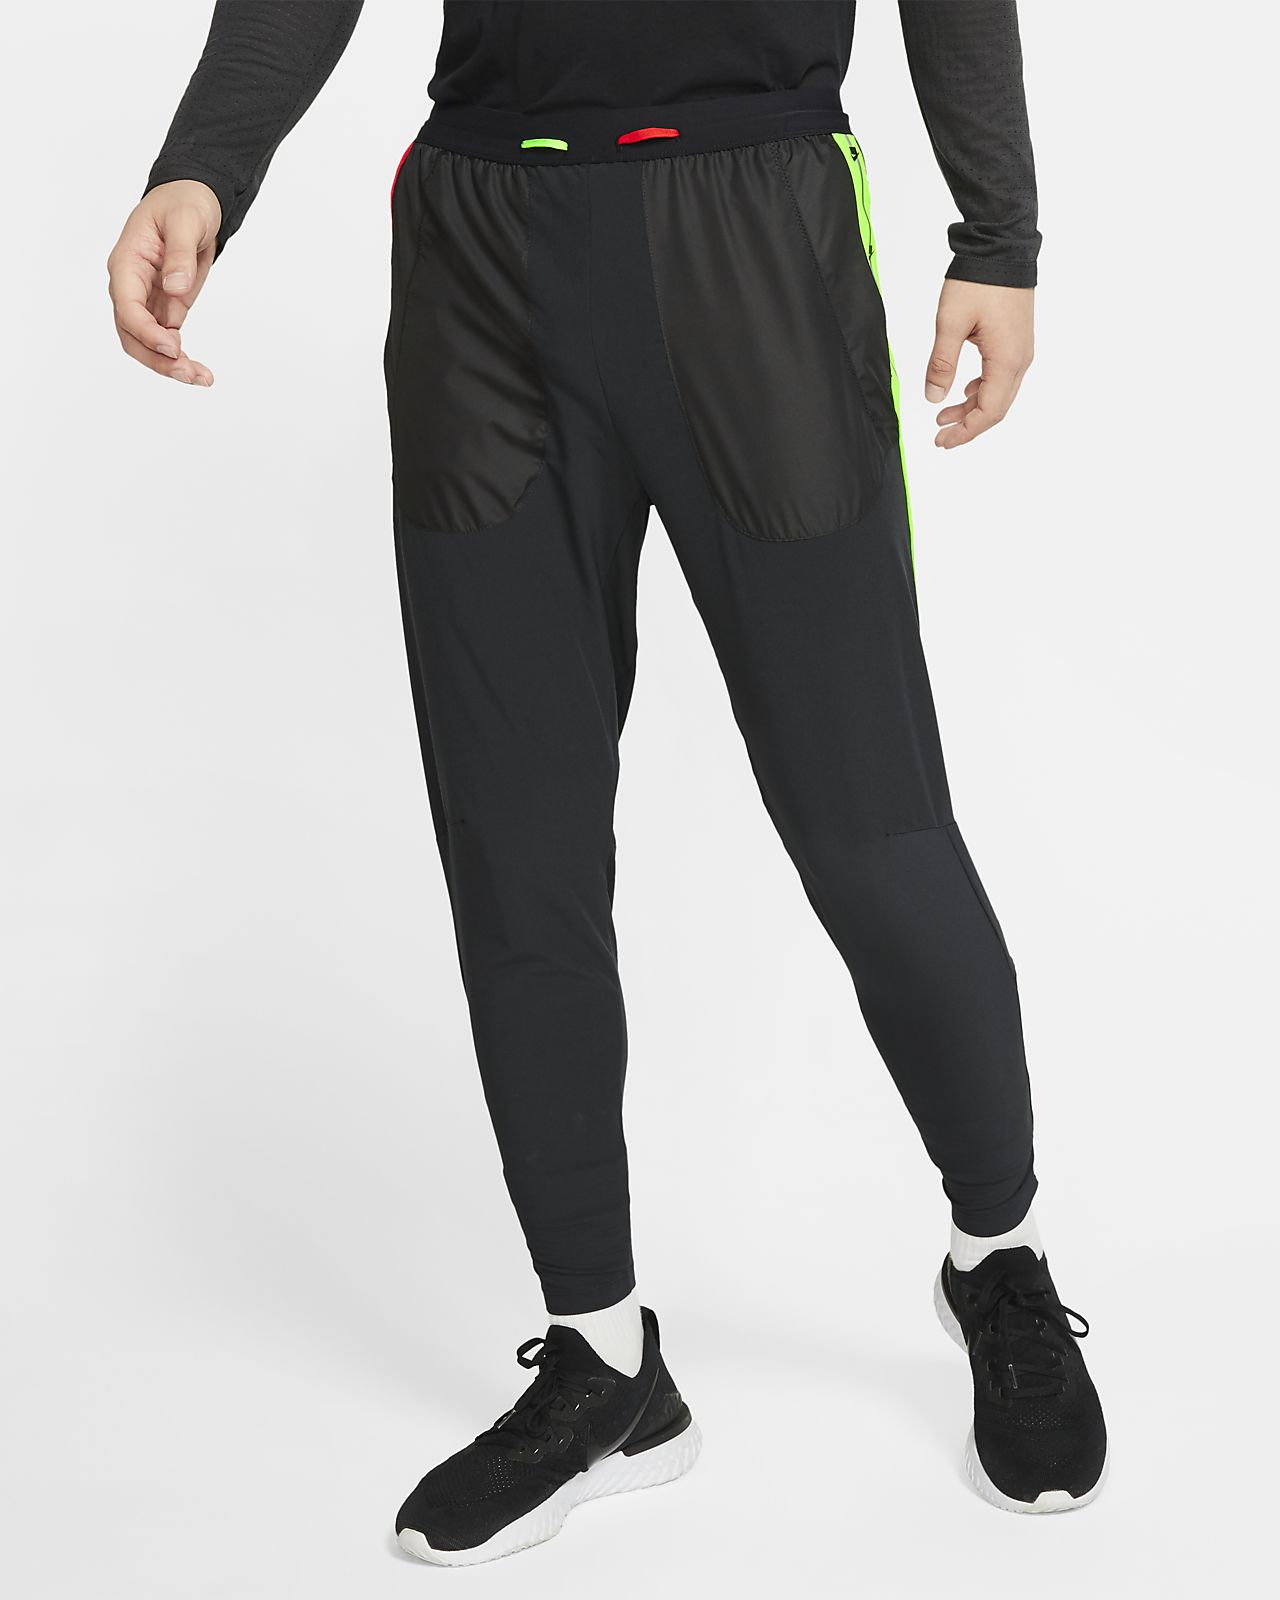 Nike Phenom Men/'s Running Pants L Gray Gym Training Flex New